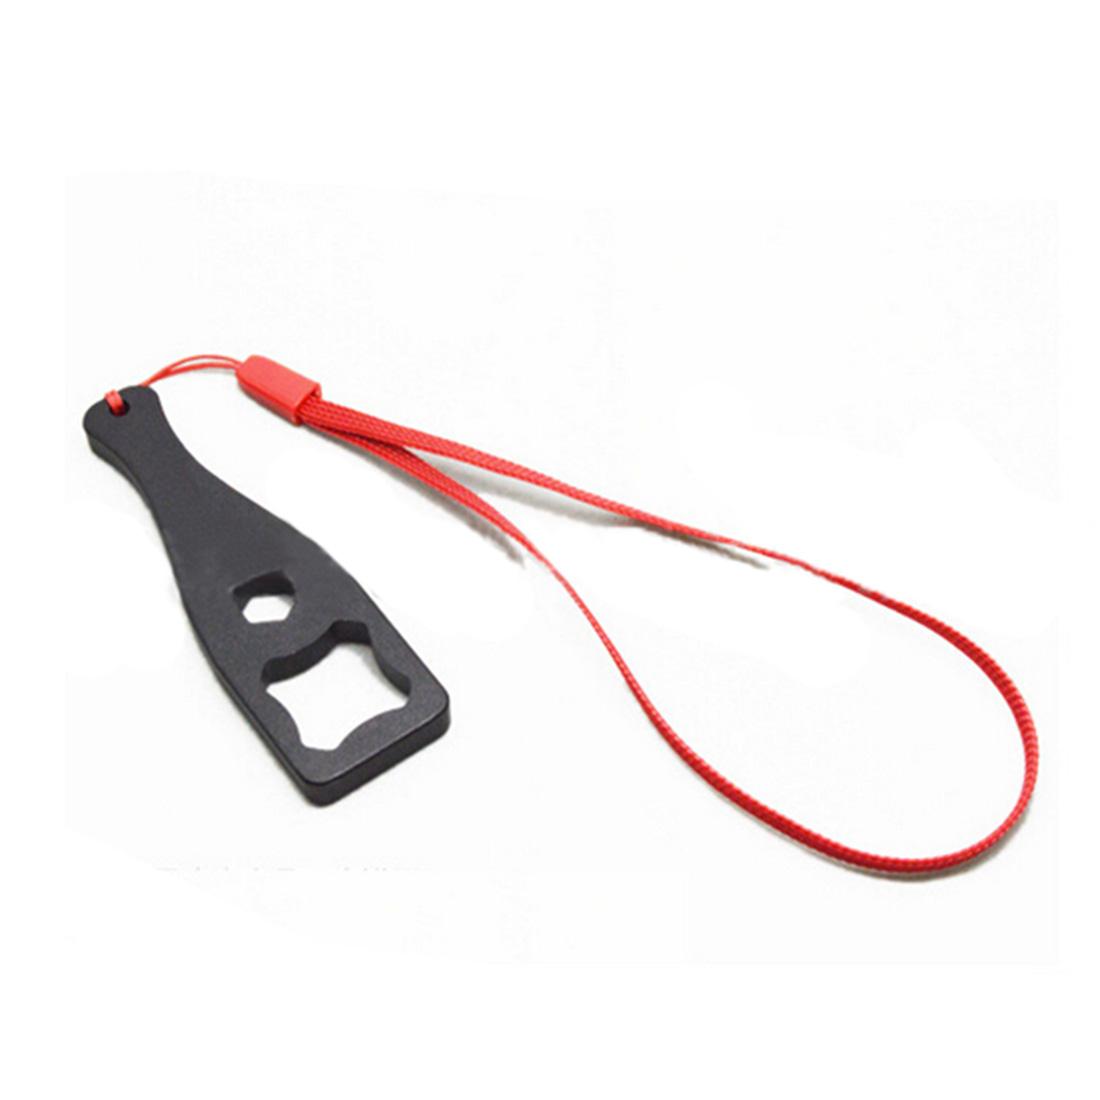 image for New Black Plastic Tighten Knob Bolt Nut Screw Wrench Spanner For Gopro